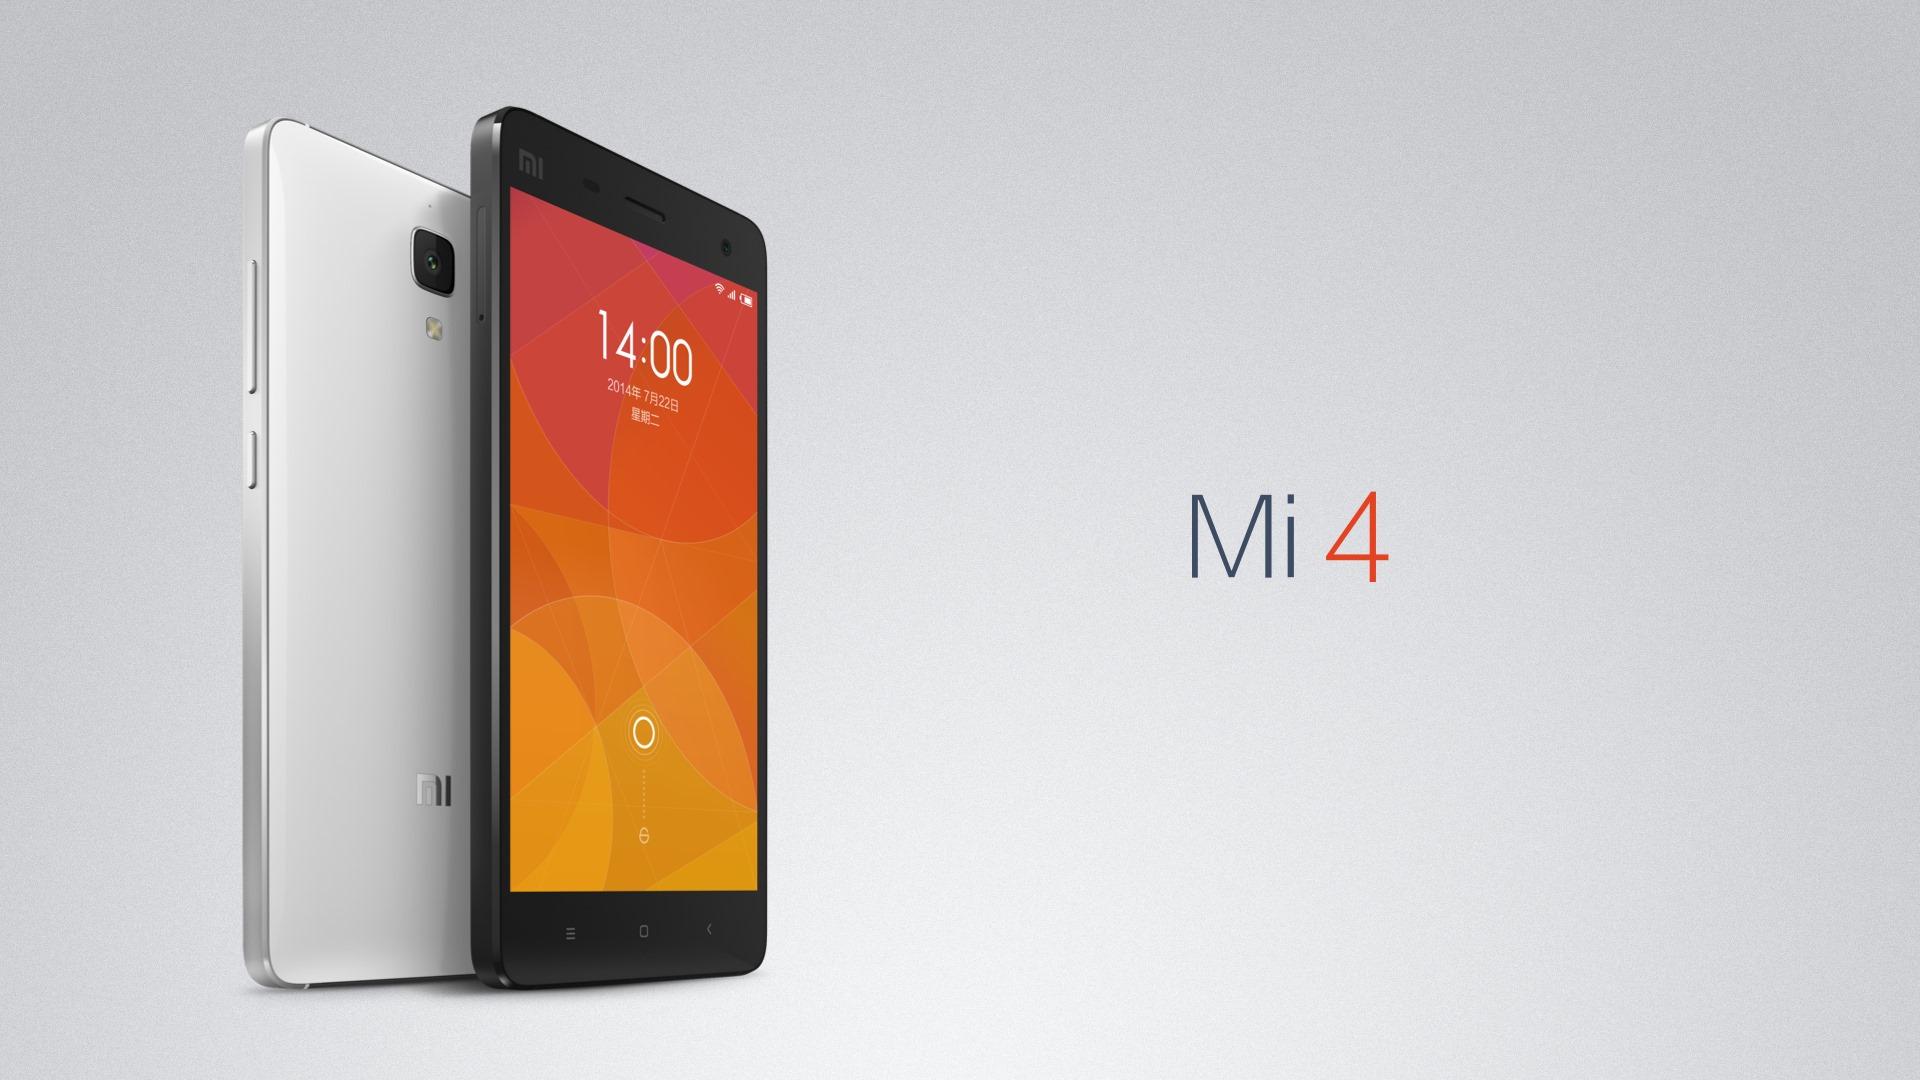 windows 10 mobile ist jetzt f r das xiaomi mi4 verf gbar. Black Bedroom Furniture Sets. Home Design Ideas